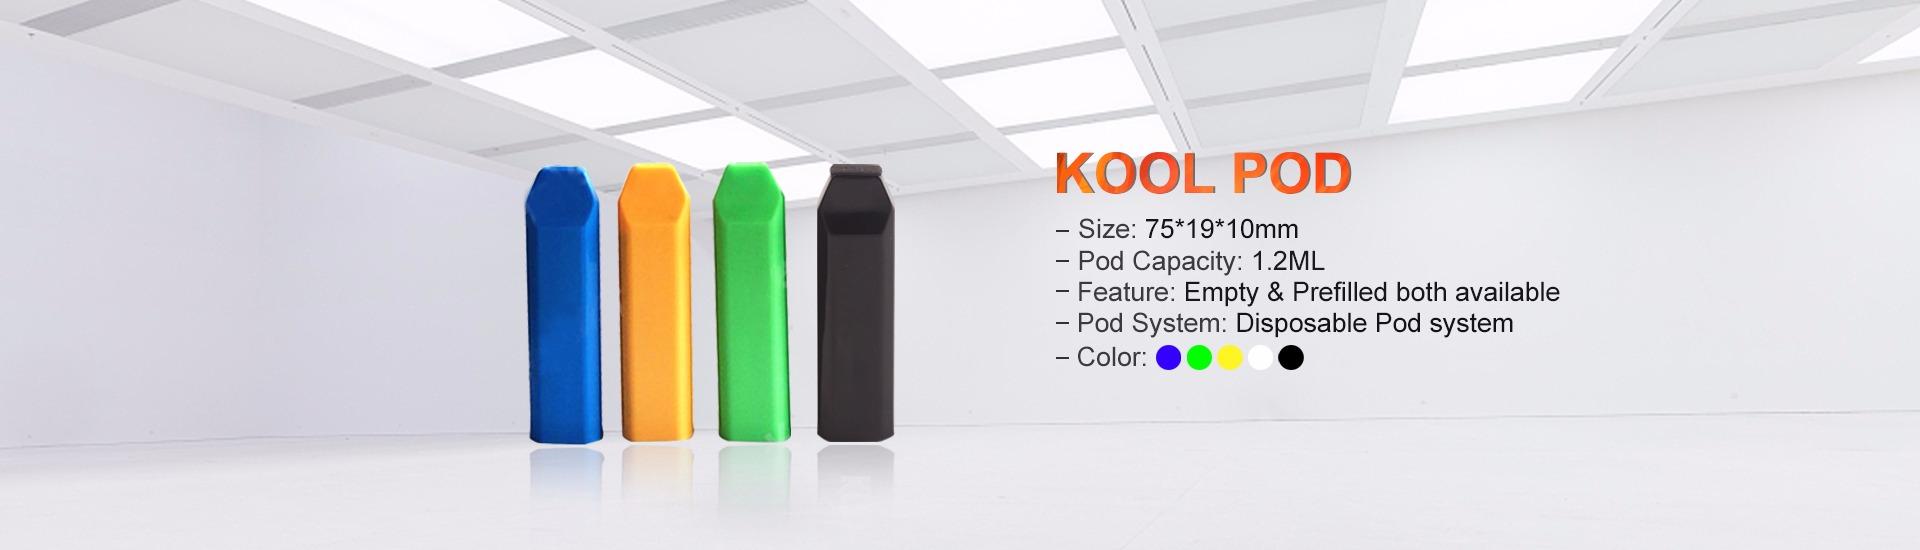 Shenzhen Kepler Technology Co , Ltd  - CBD Cartridge, Wax